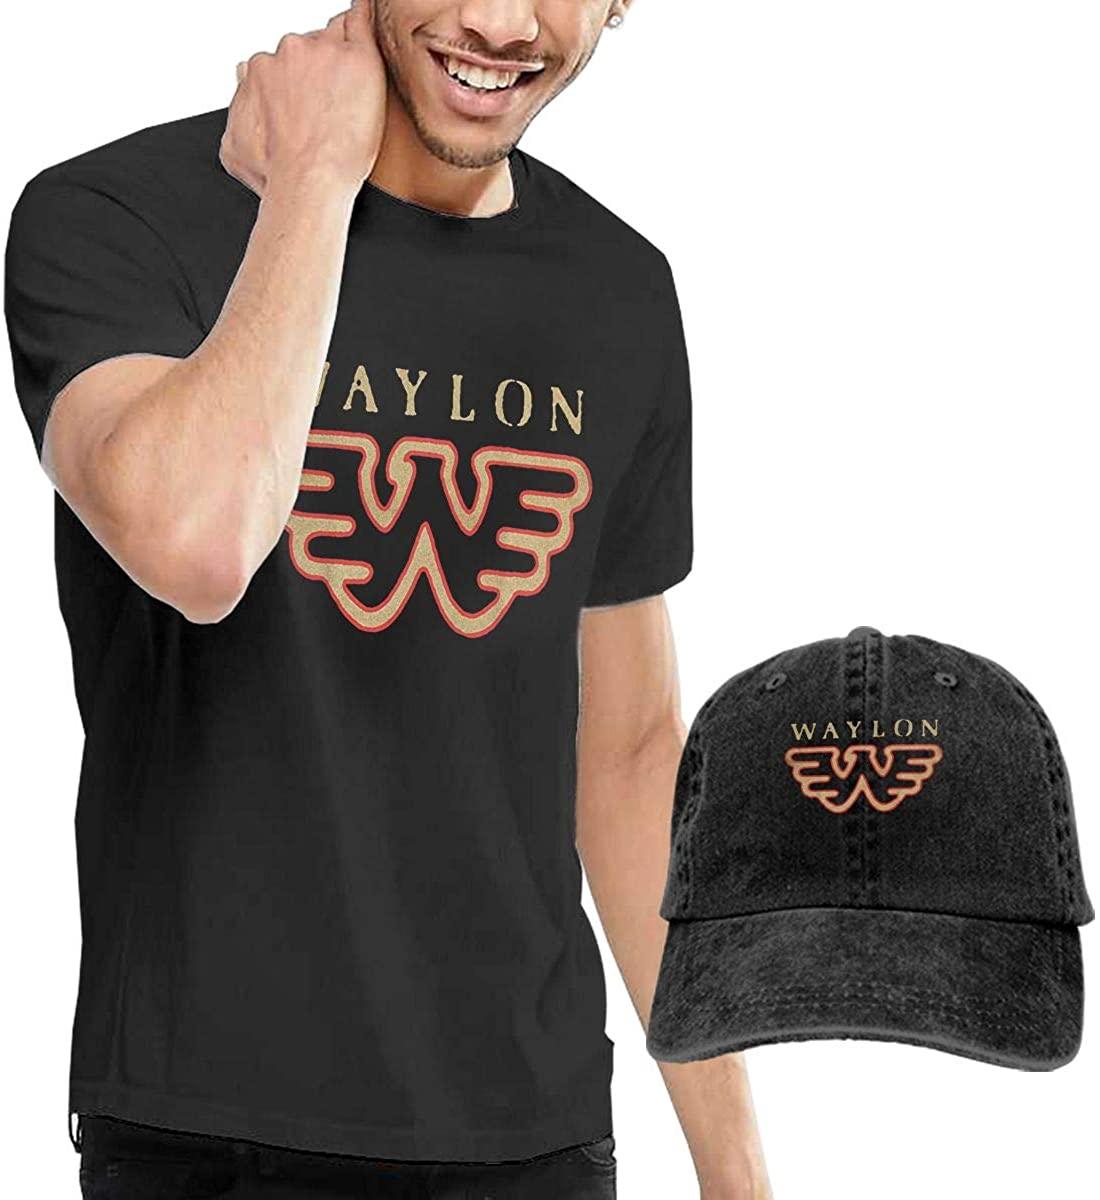 Reneealsip Waylon Jennings Fashionable Men's T-Shirt, Short Sleeve and Cowboy Hat Combination